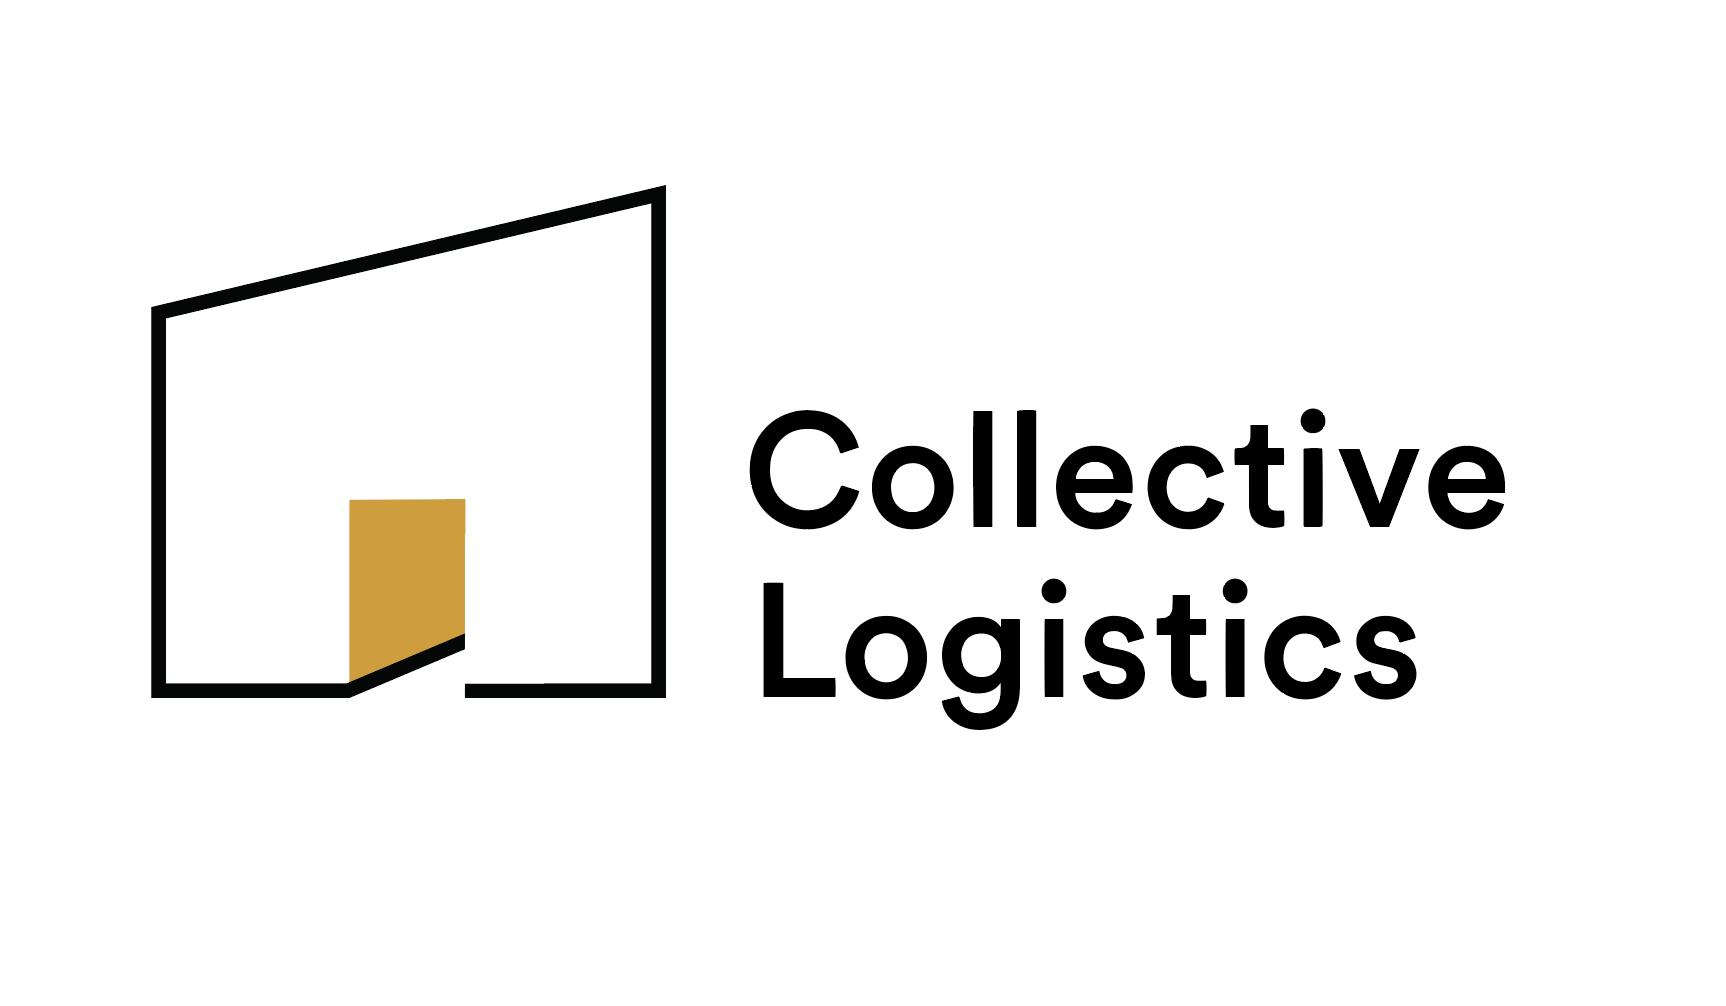 Collective Logistics